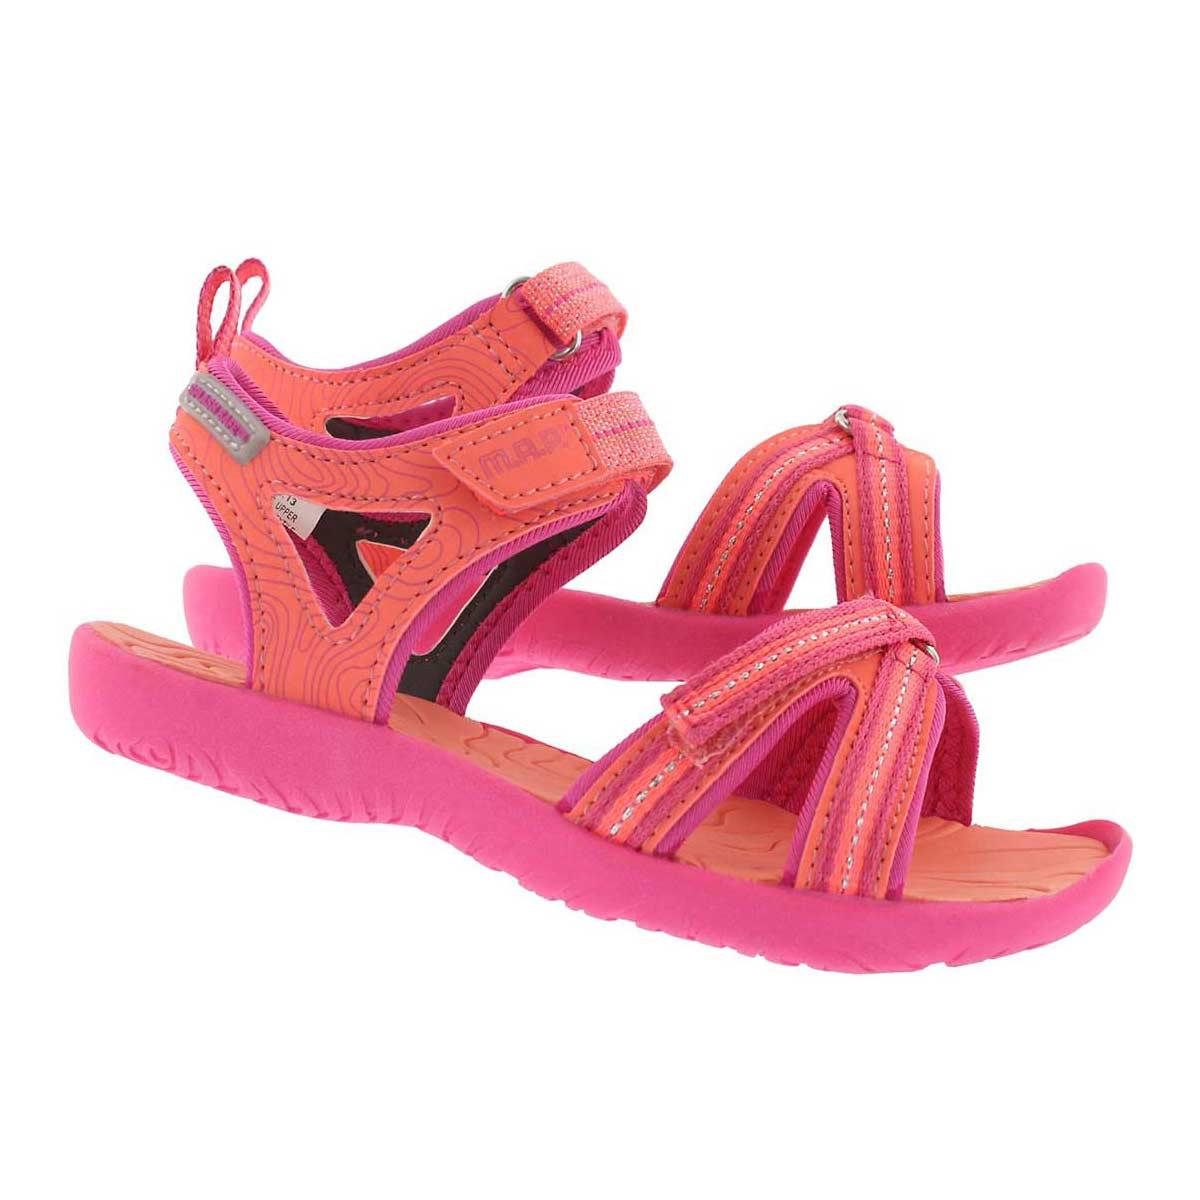 Grls Lorna coral/pink casual sandal